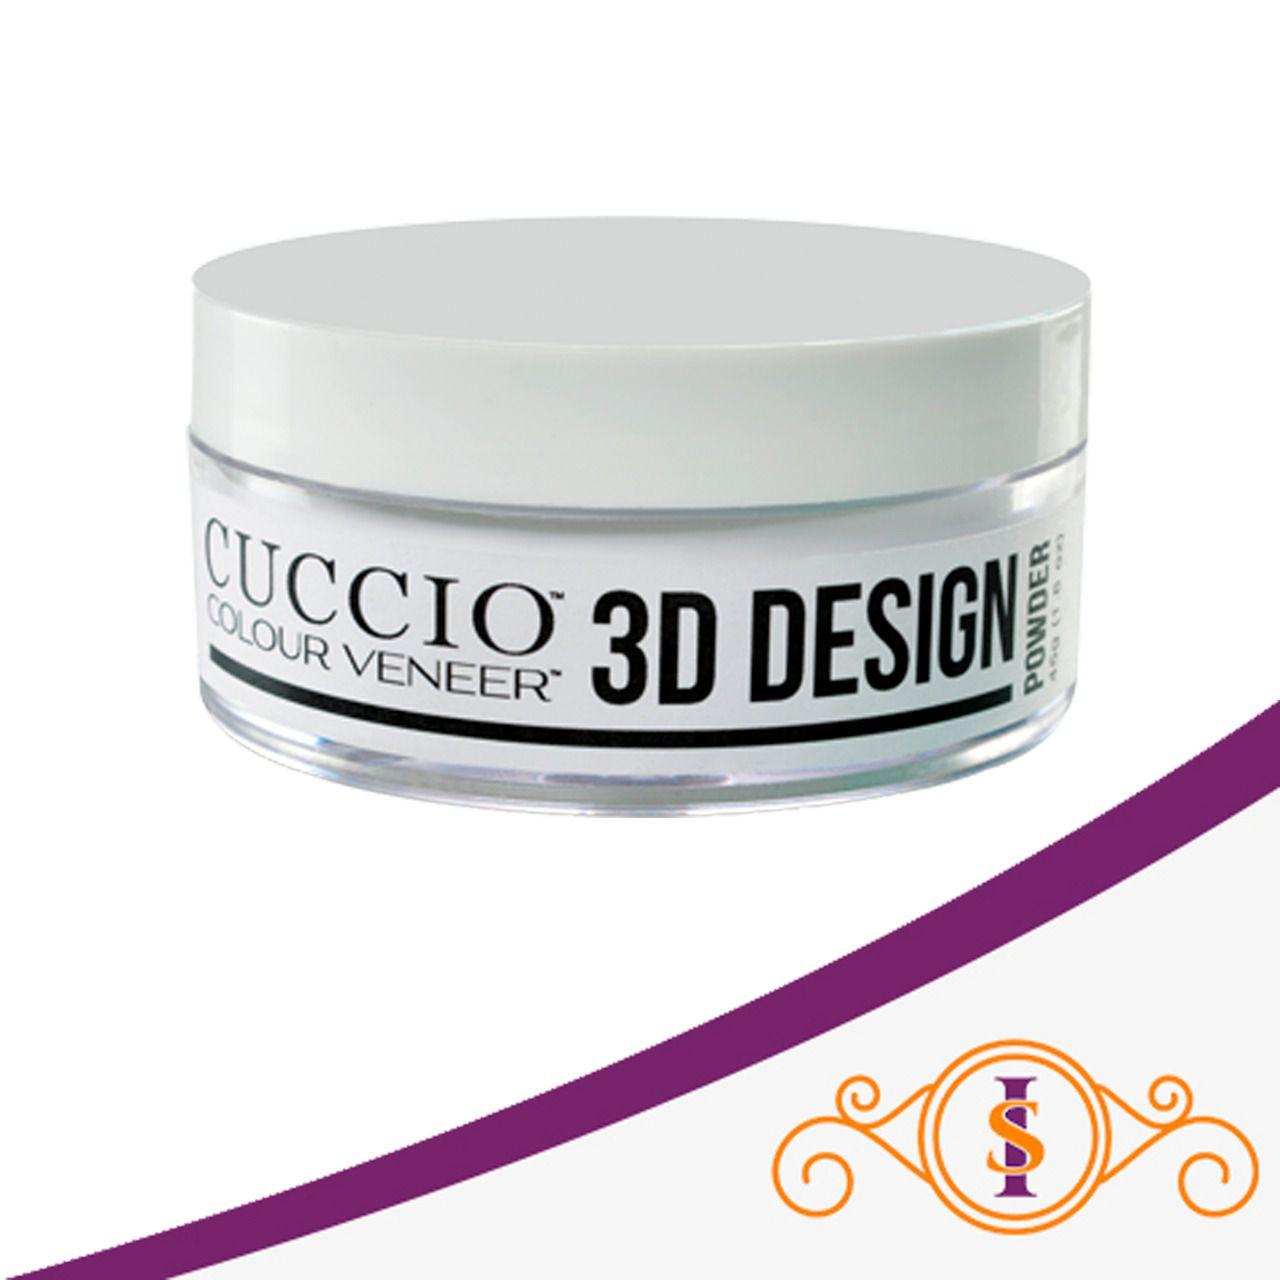 Pó Acrílico 3D Powder Veneer - 14g - White